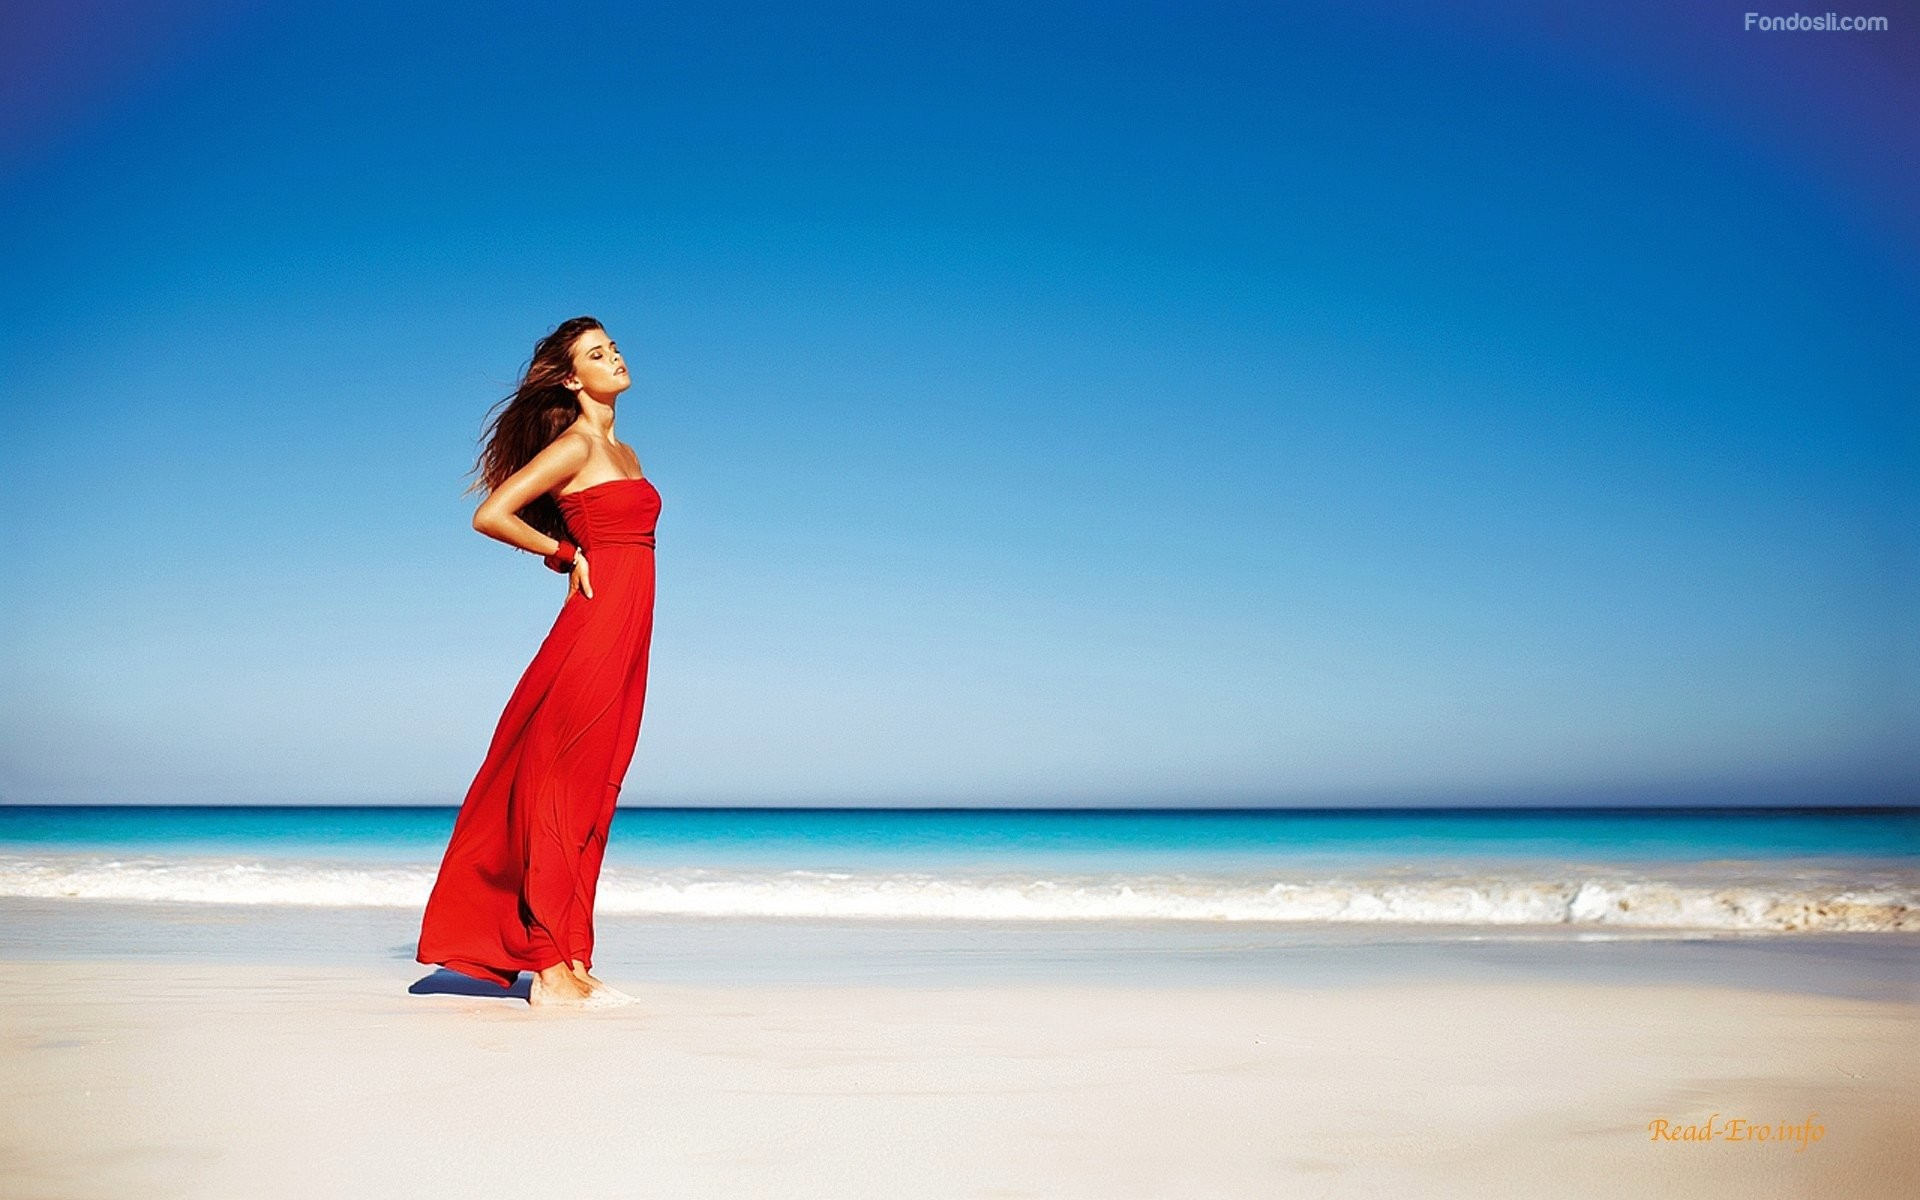 Donna in spiaggia nude picture 81